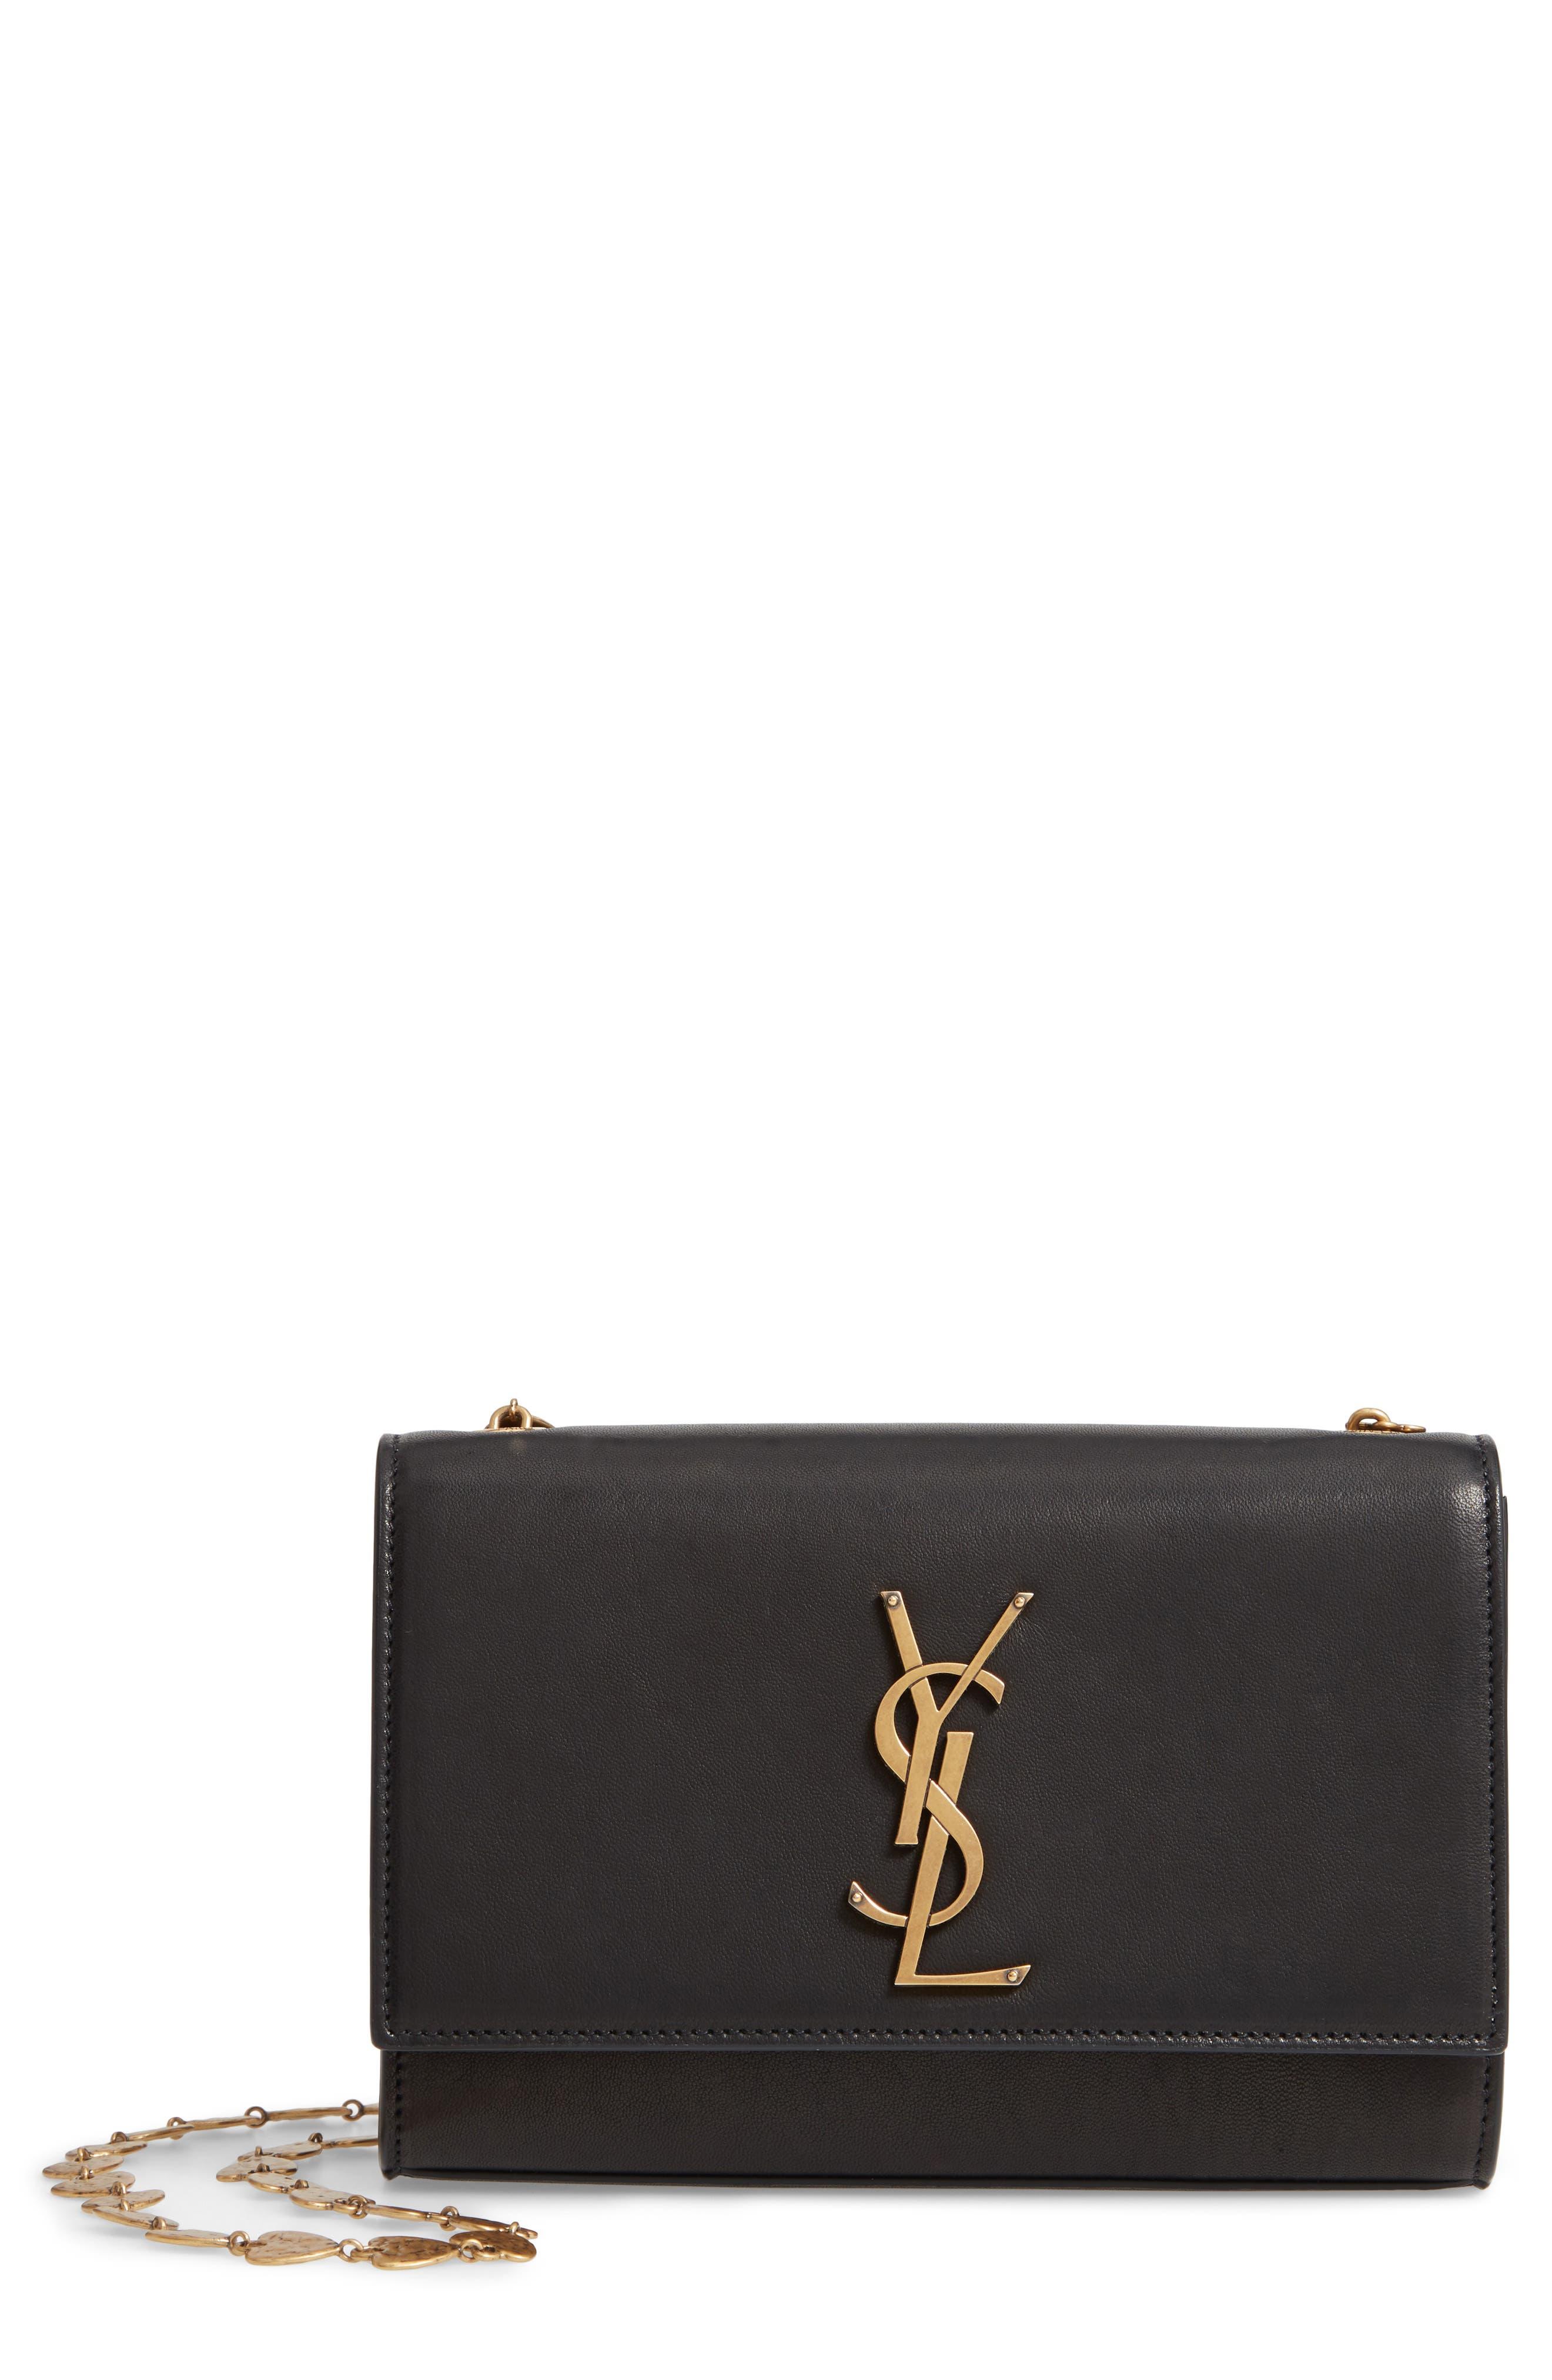 Small Kate Leather Shoulder Bag by Saint Laurent